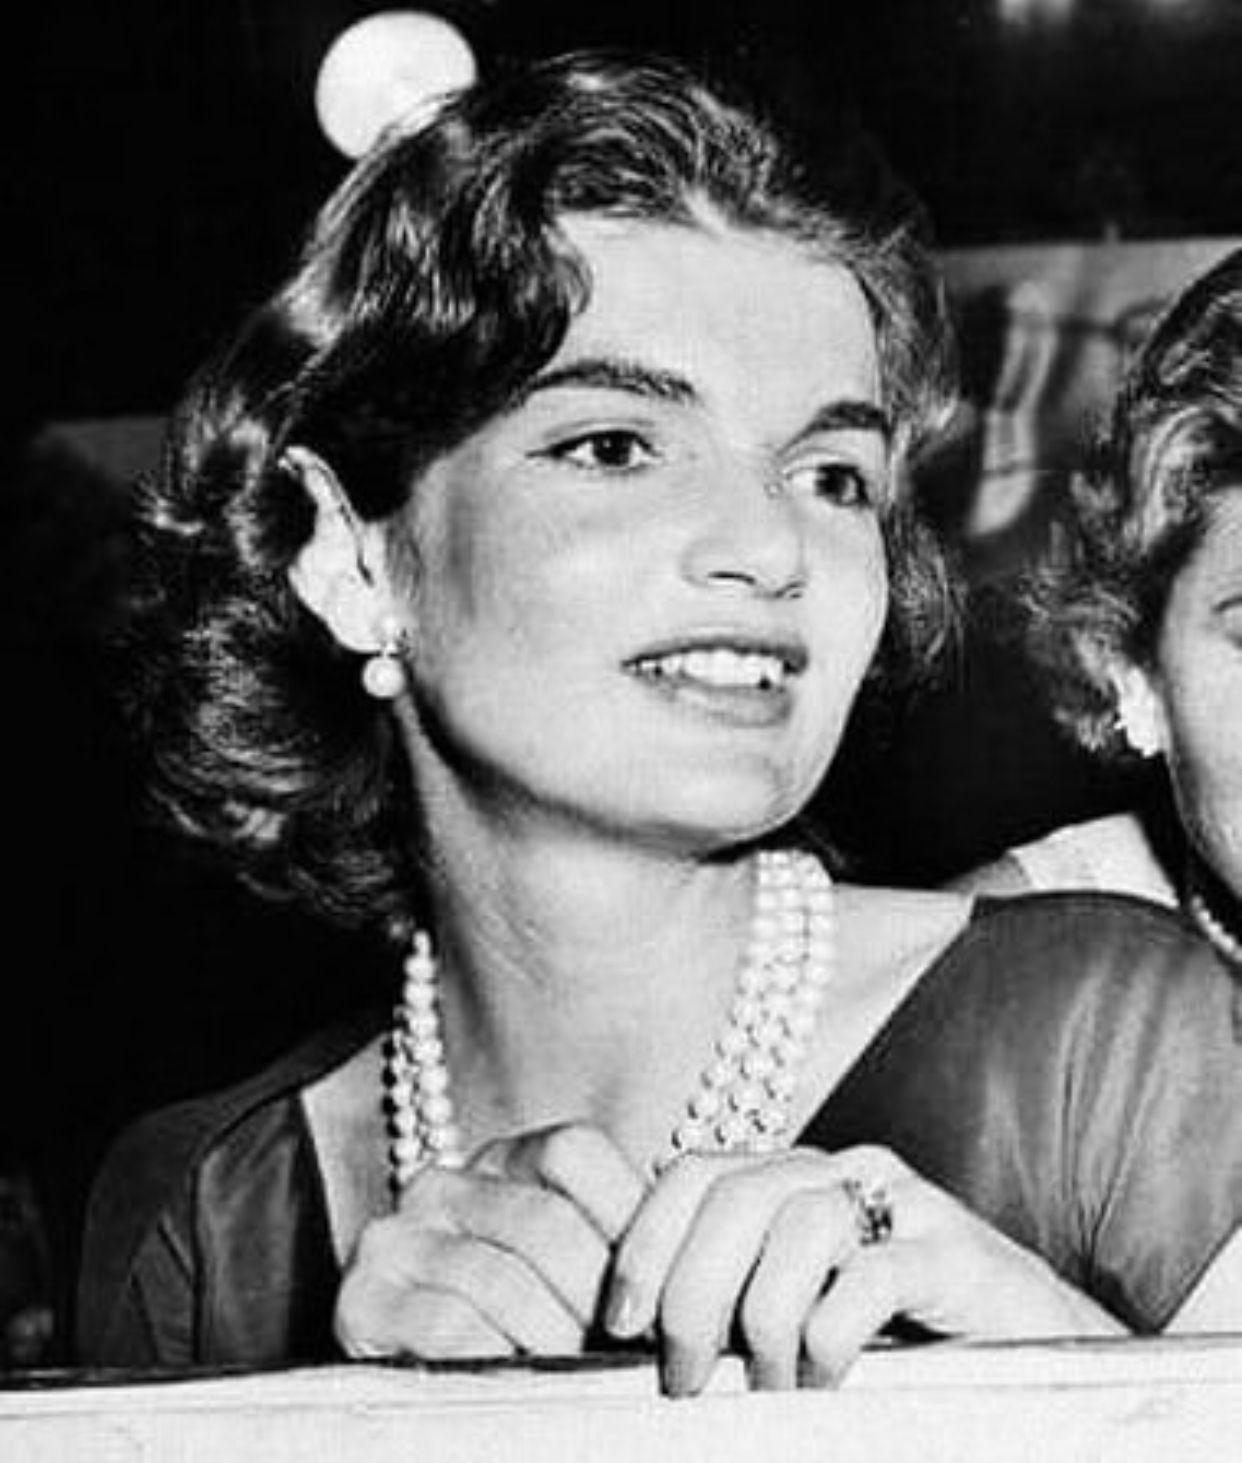 Pin By Maxima On Jfk Jackie Kennedy Jackie Kennedy Style Jacqueline Kennedy Onassis